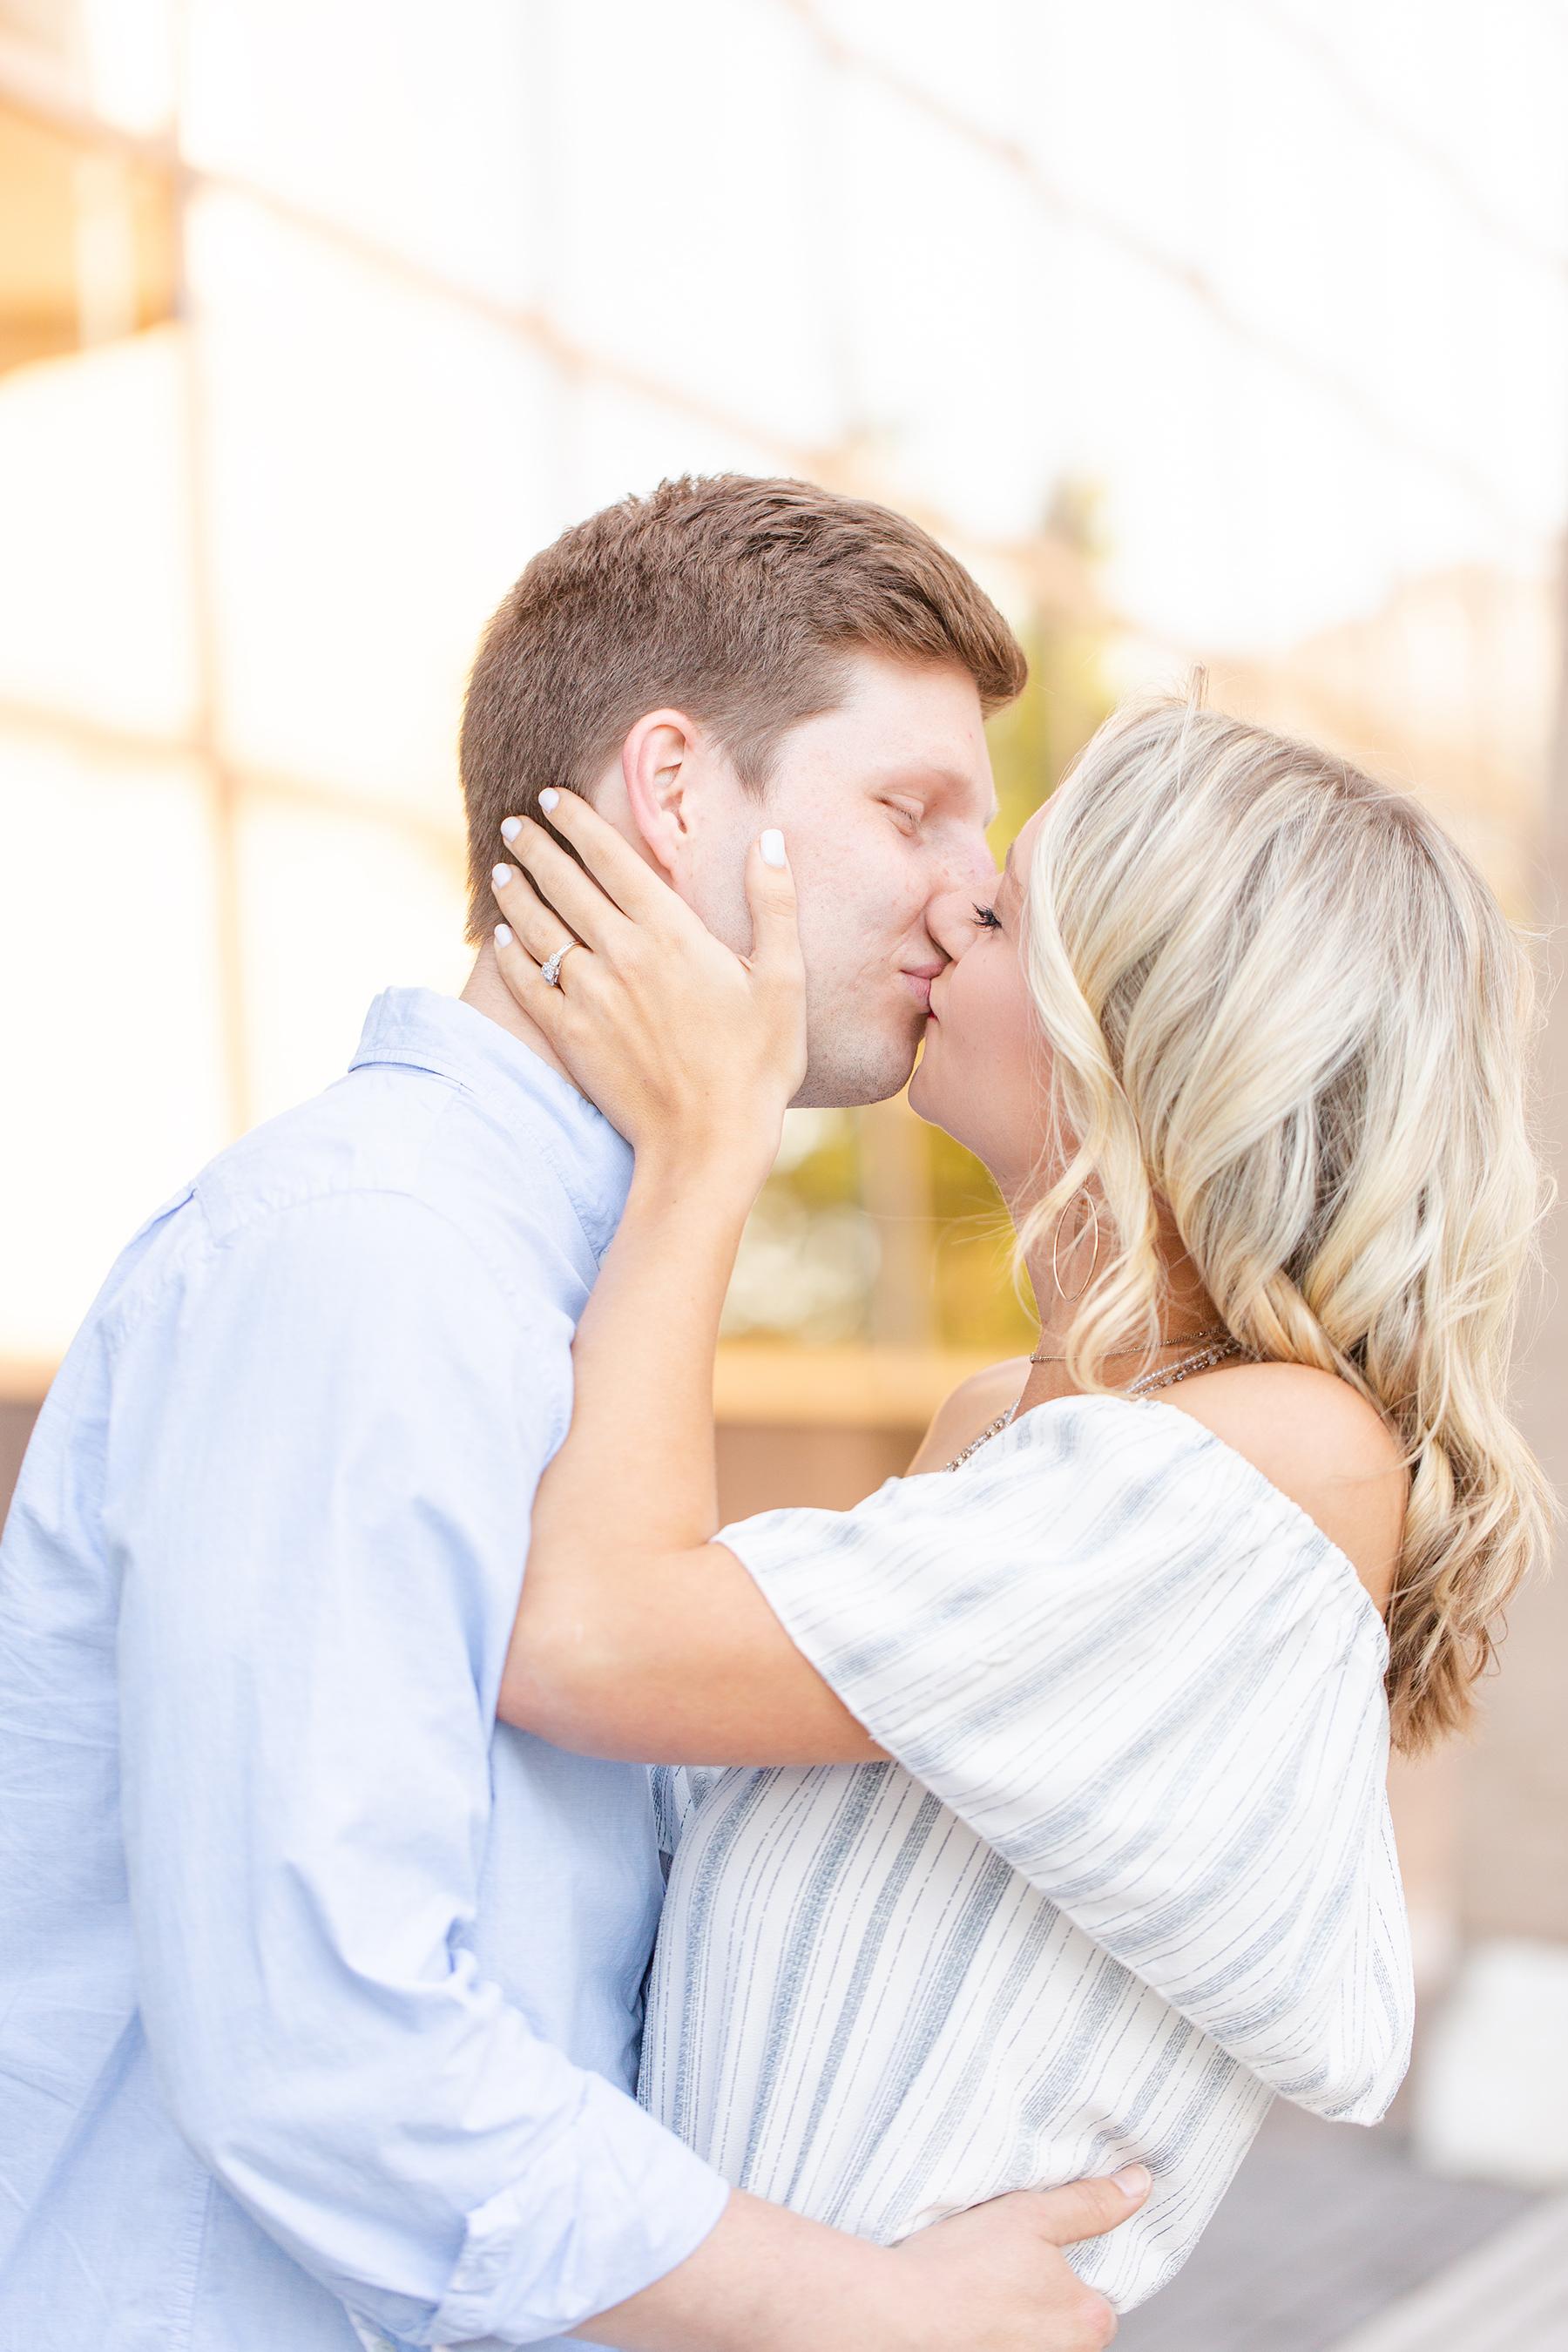 Sarah + Nathan | Engagement